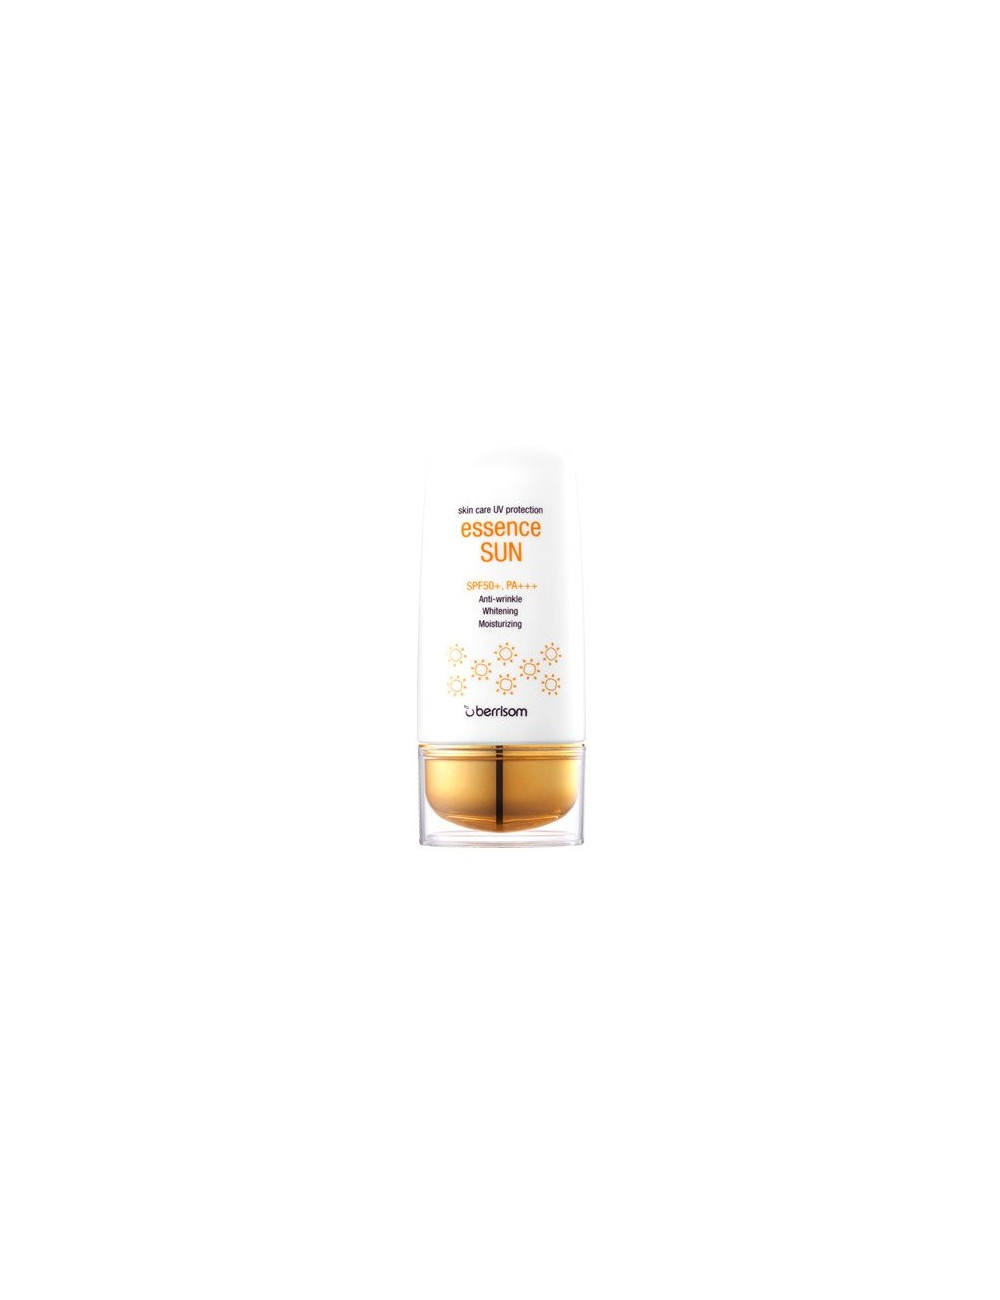 Crema Solar Berrisom Essence Sun SPF50+ PA+++